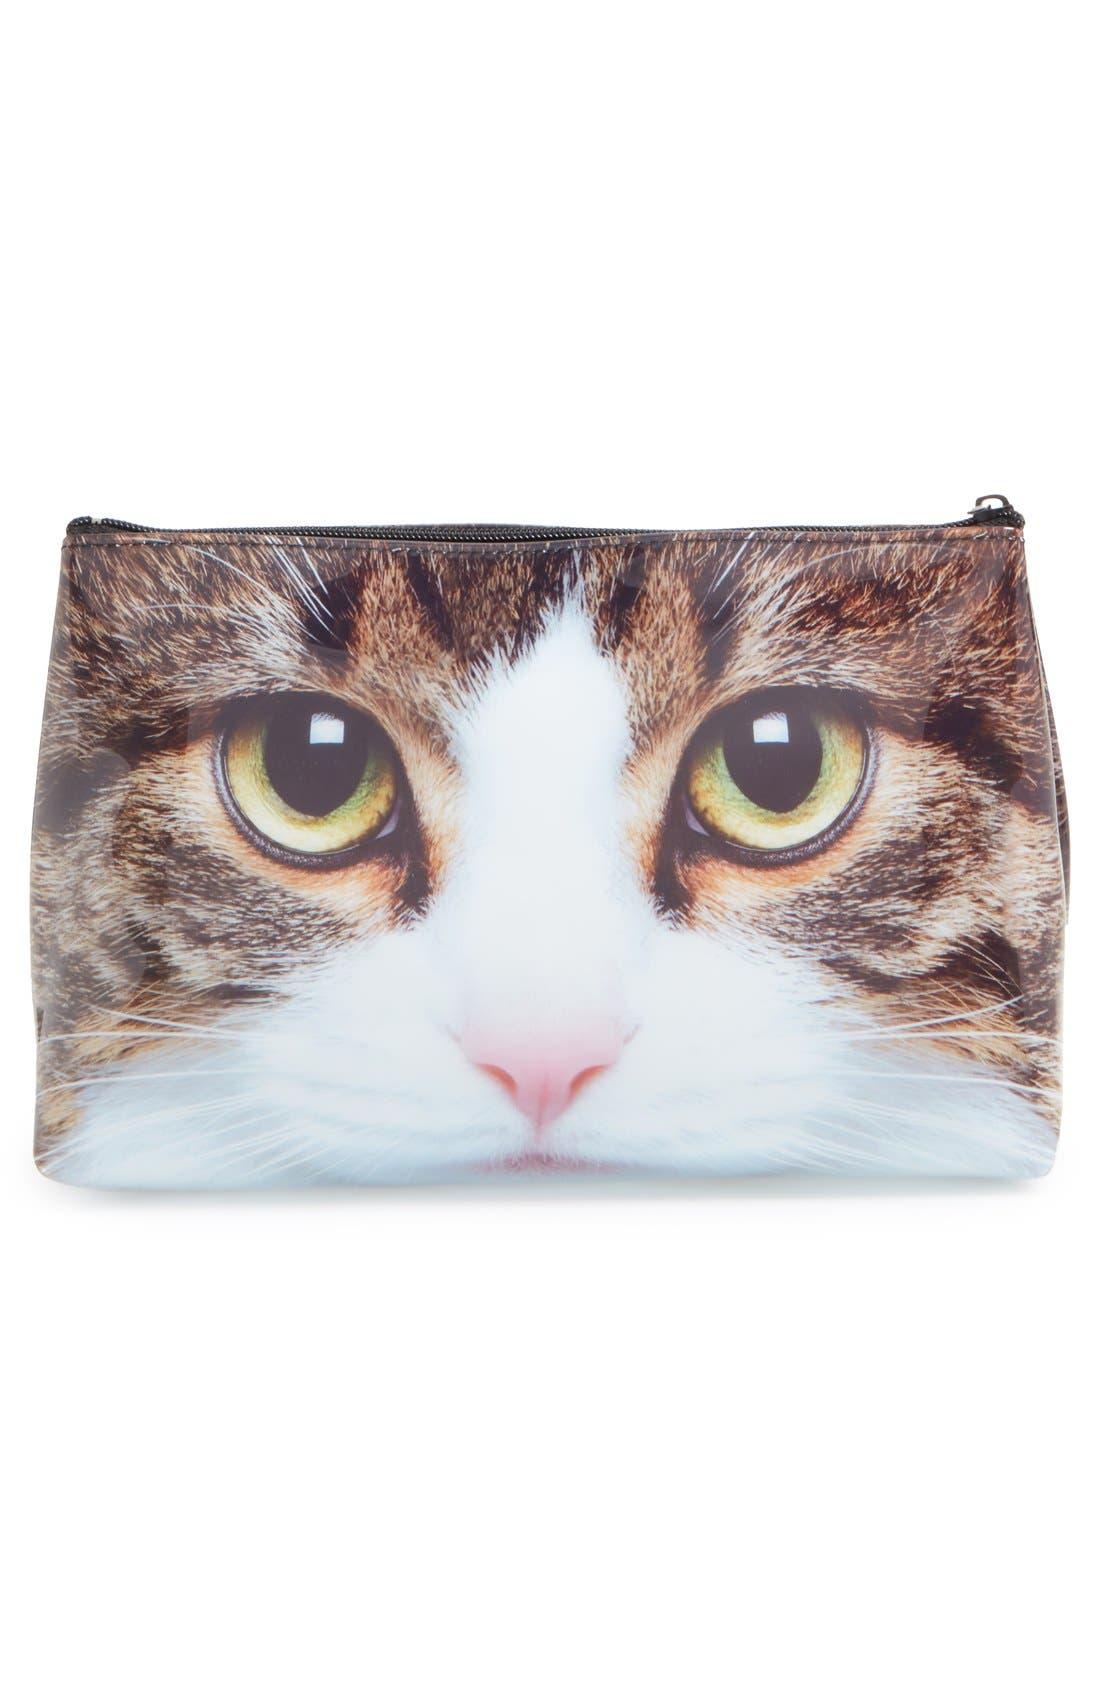 'Tabby Cat' Cosmetics Bag,                             Alternate thumbnail 4, color,                             200